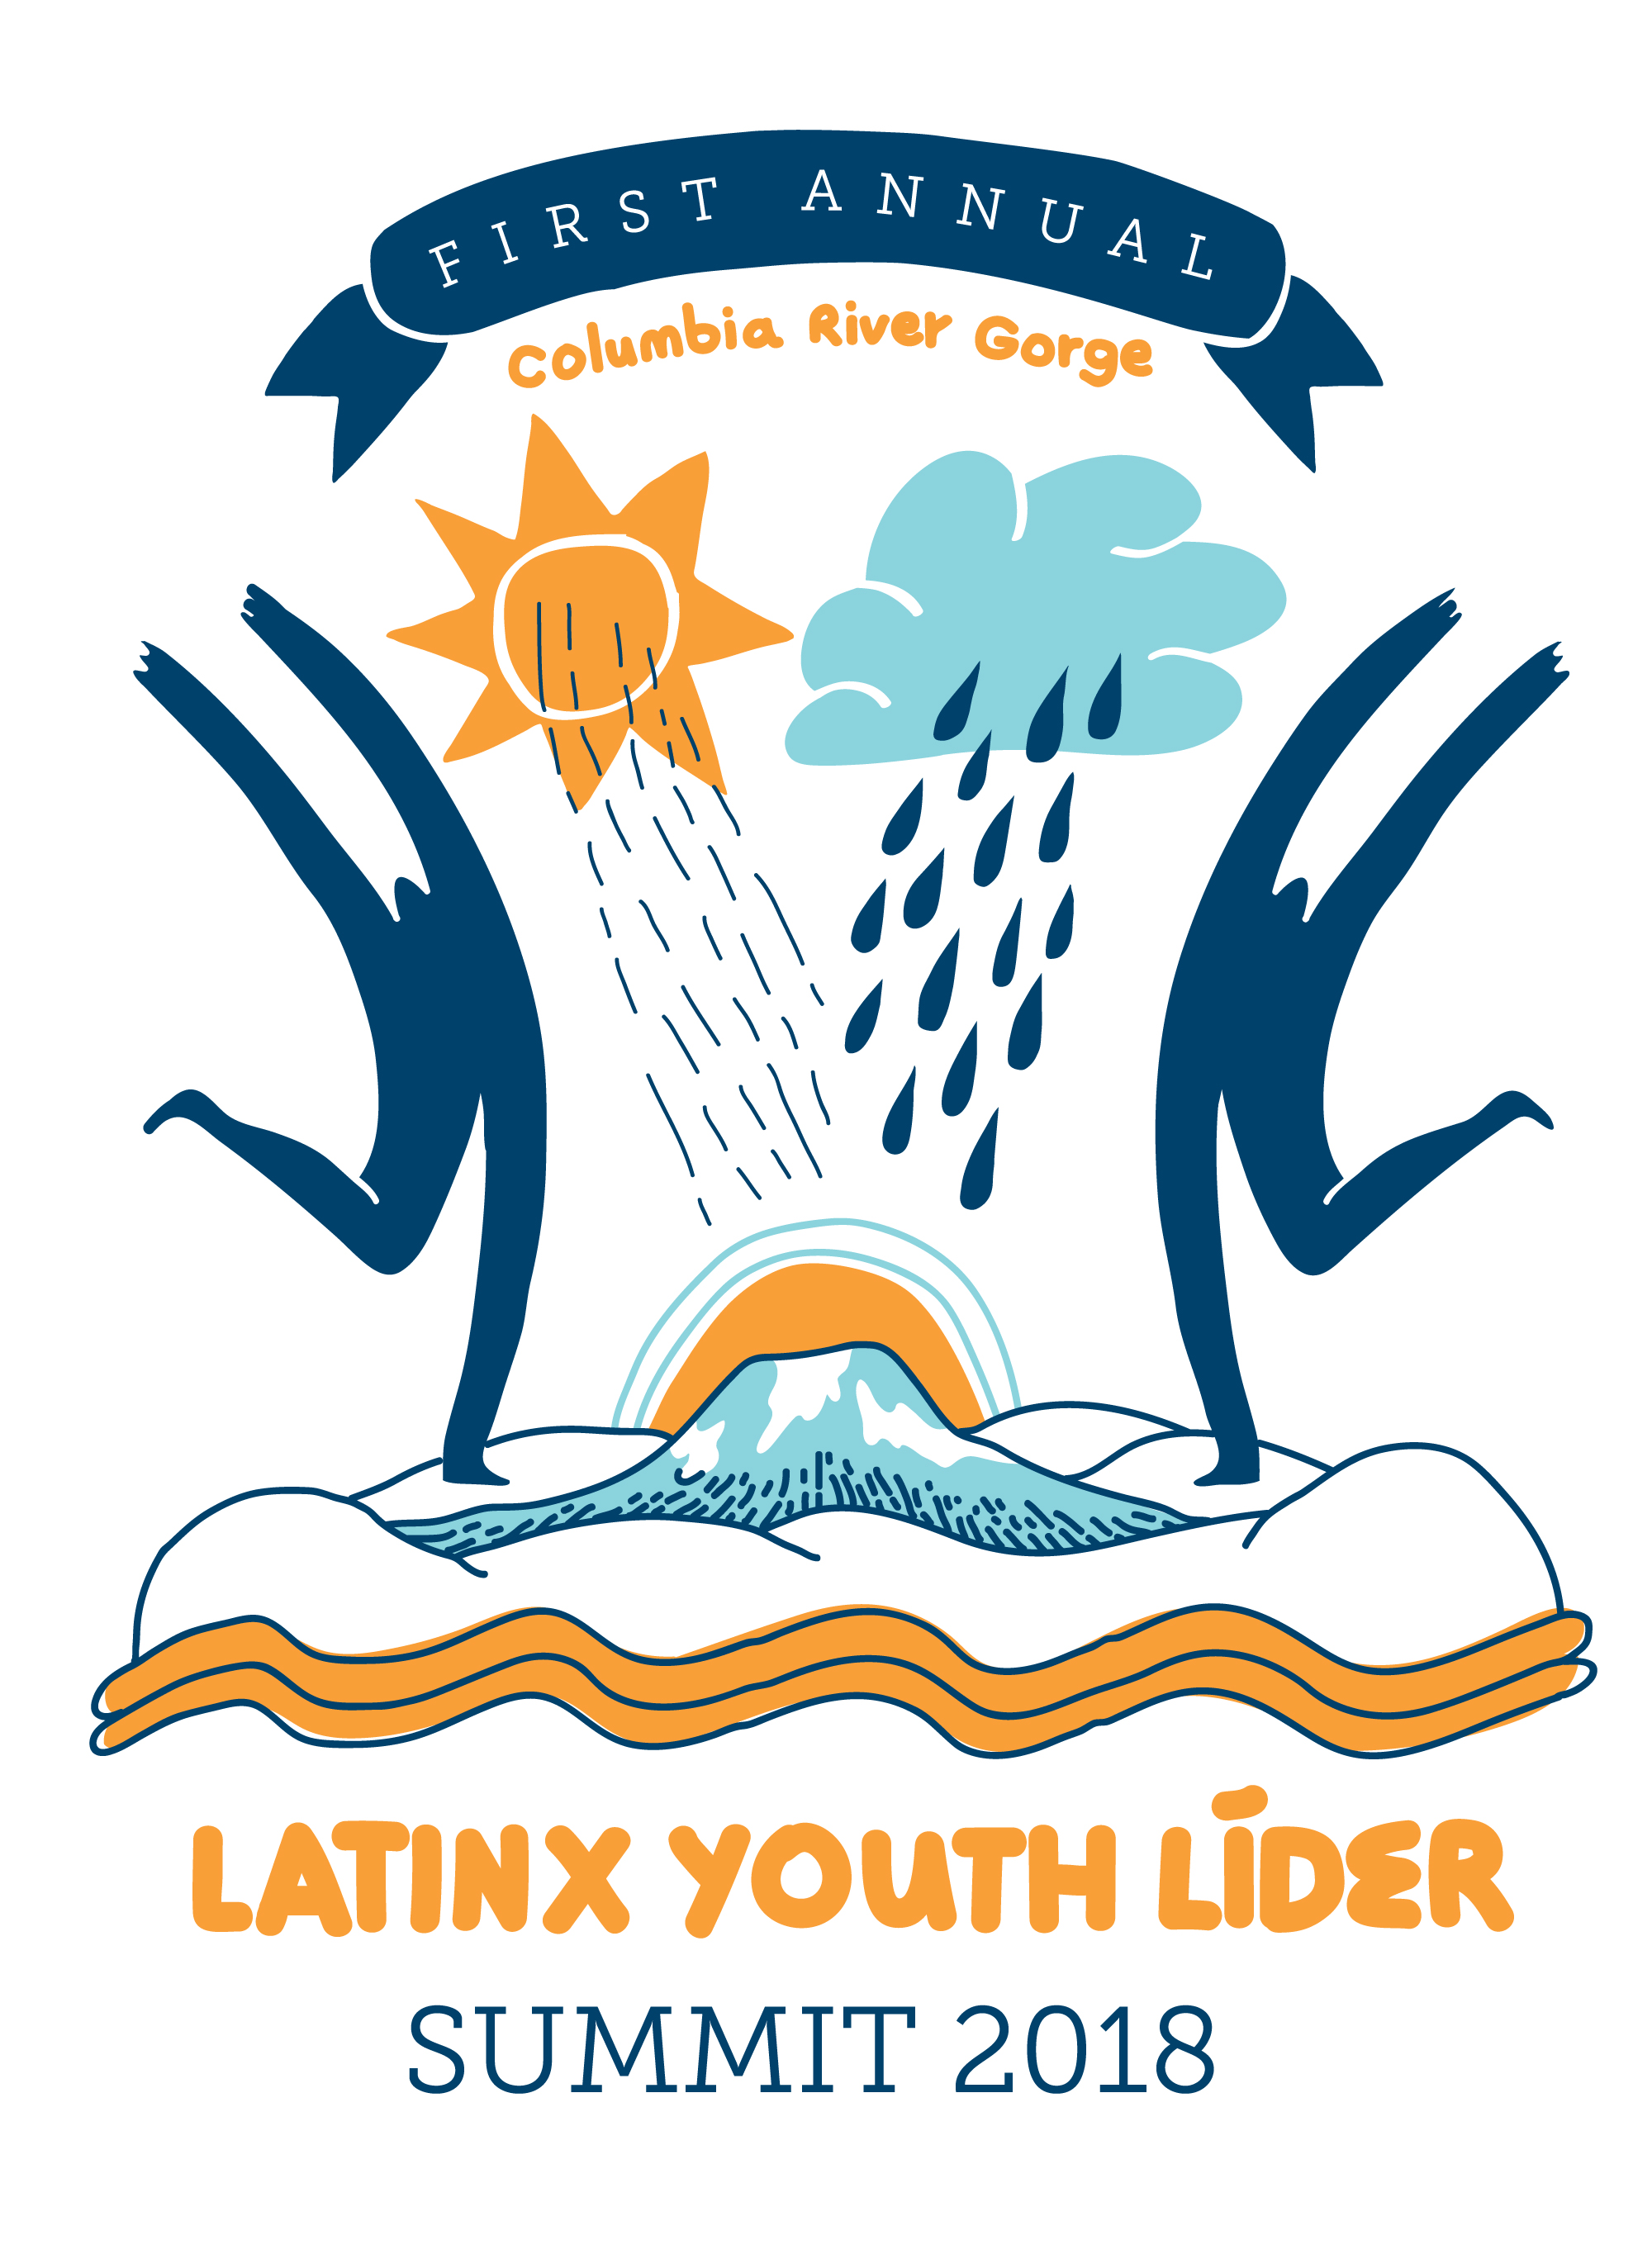 Latinx-Youth-Lider-Summit-2018.jpg